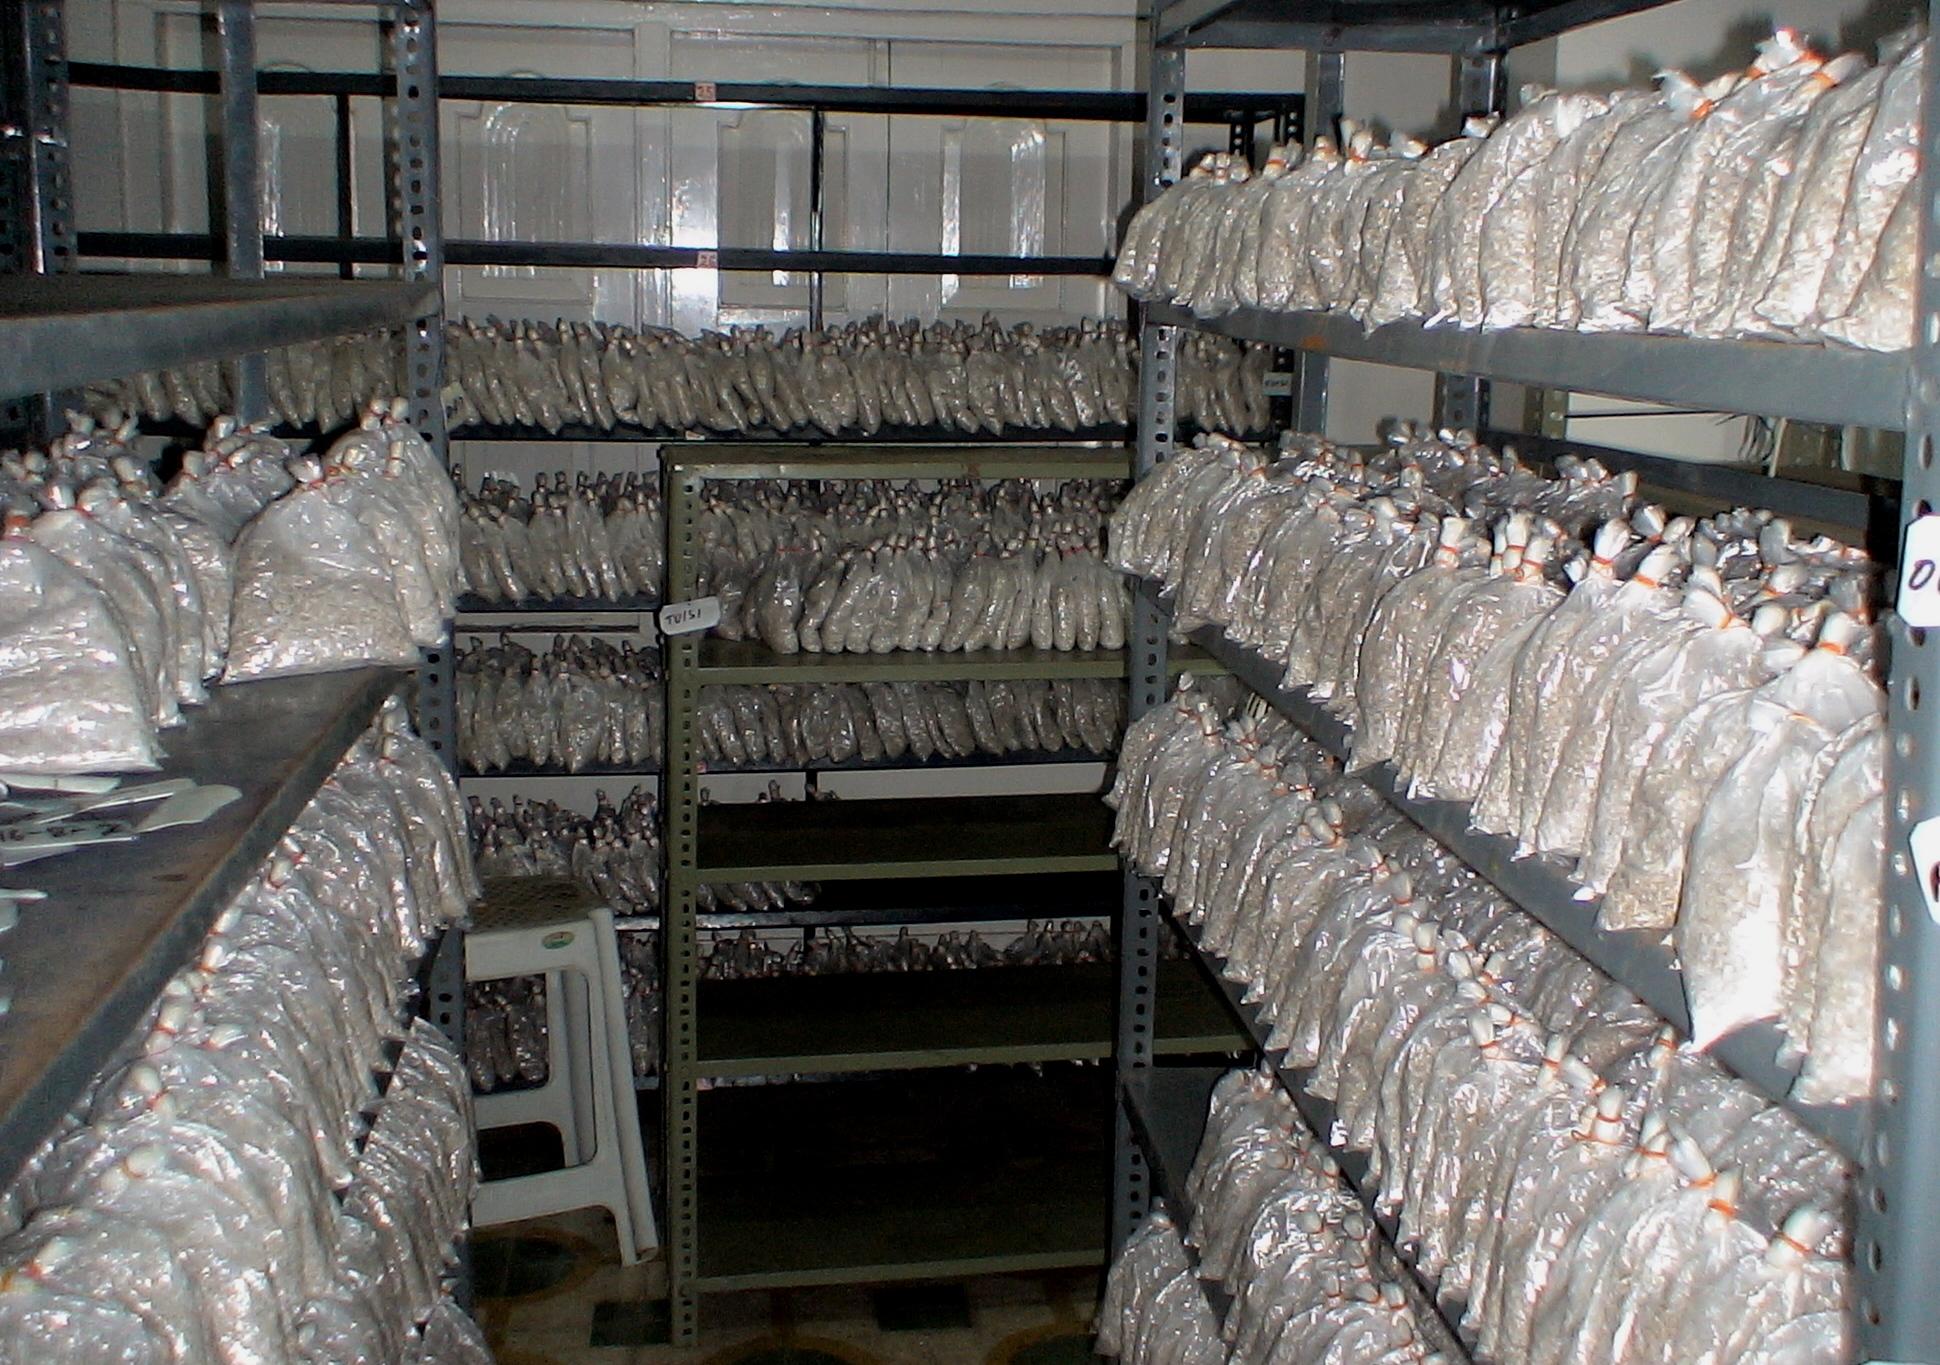 Mushroom Biotech – supplies mushroom spawns developed in the liquid